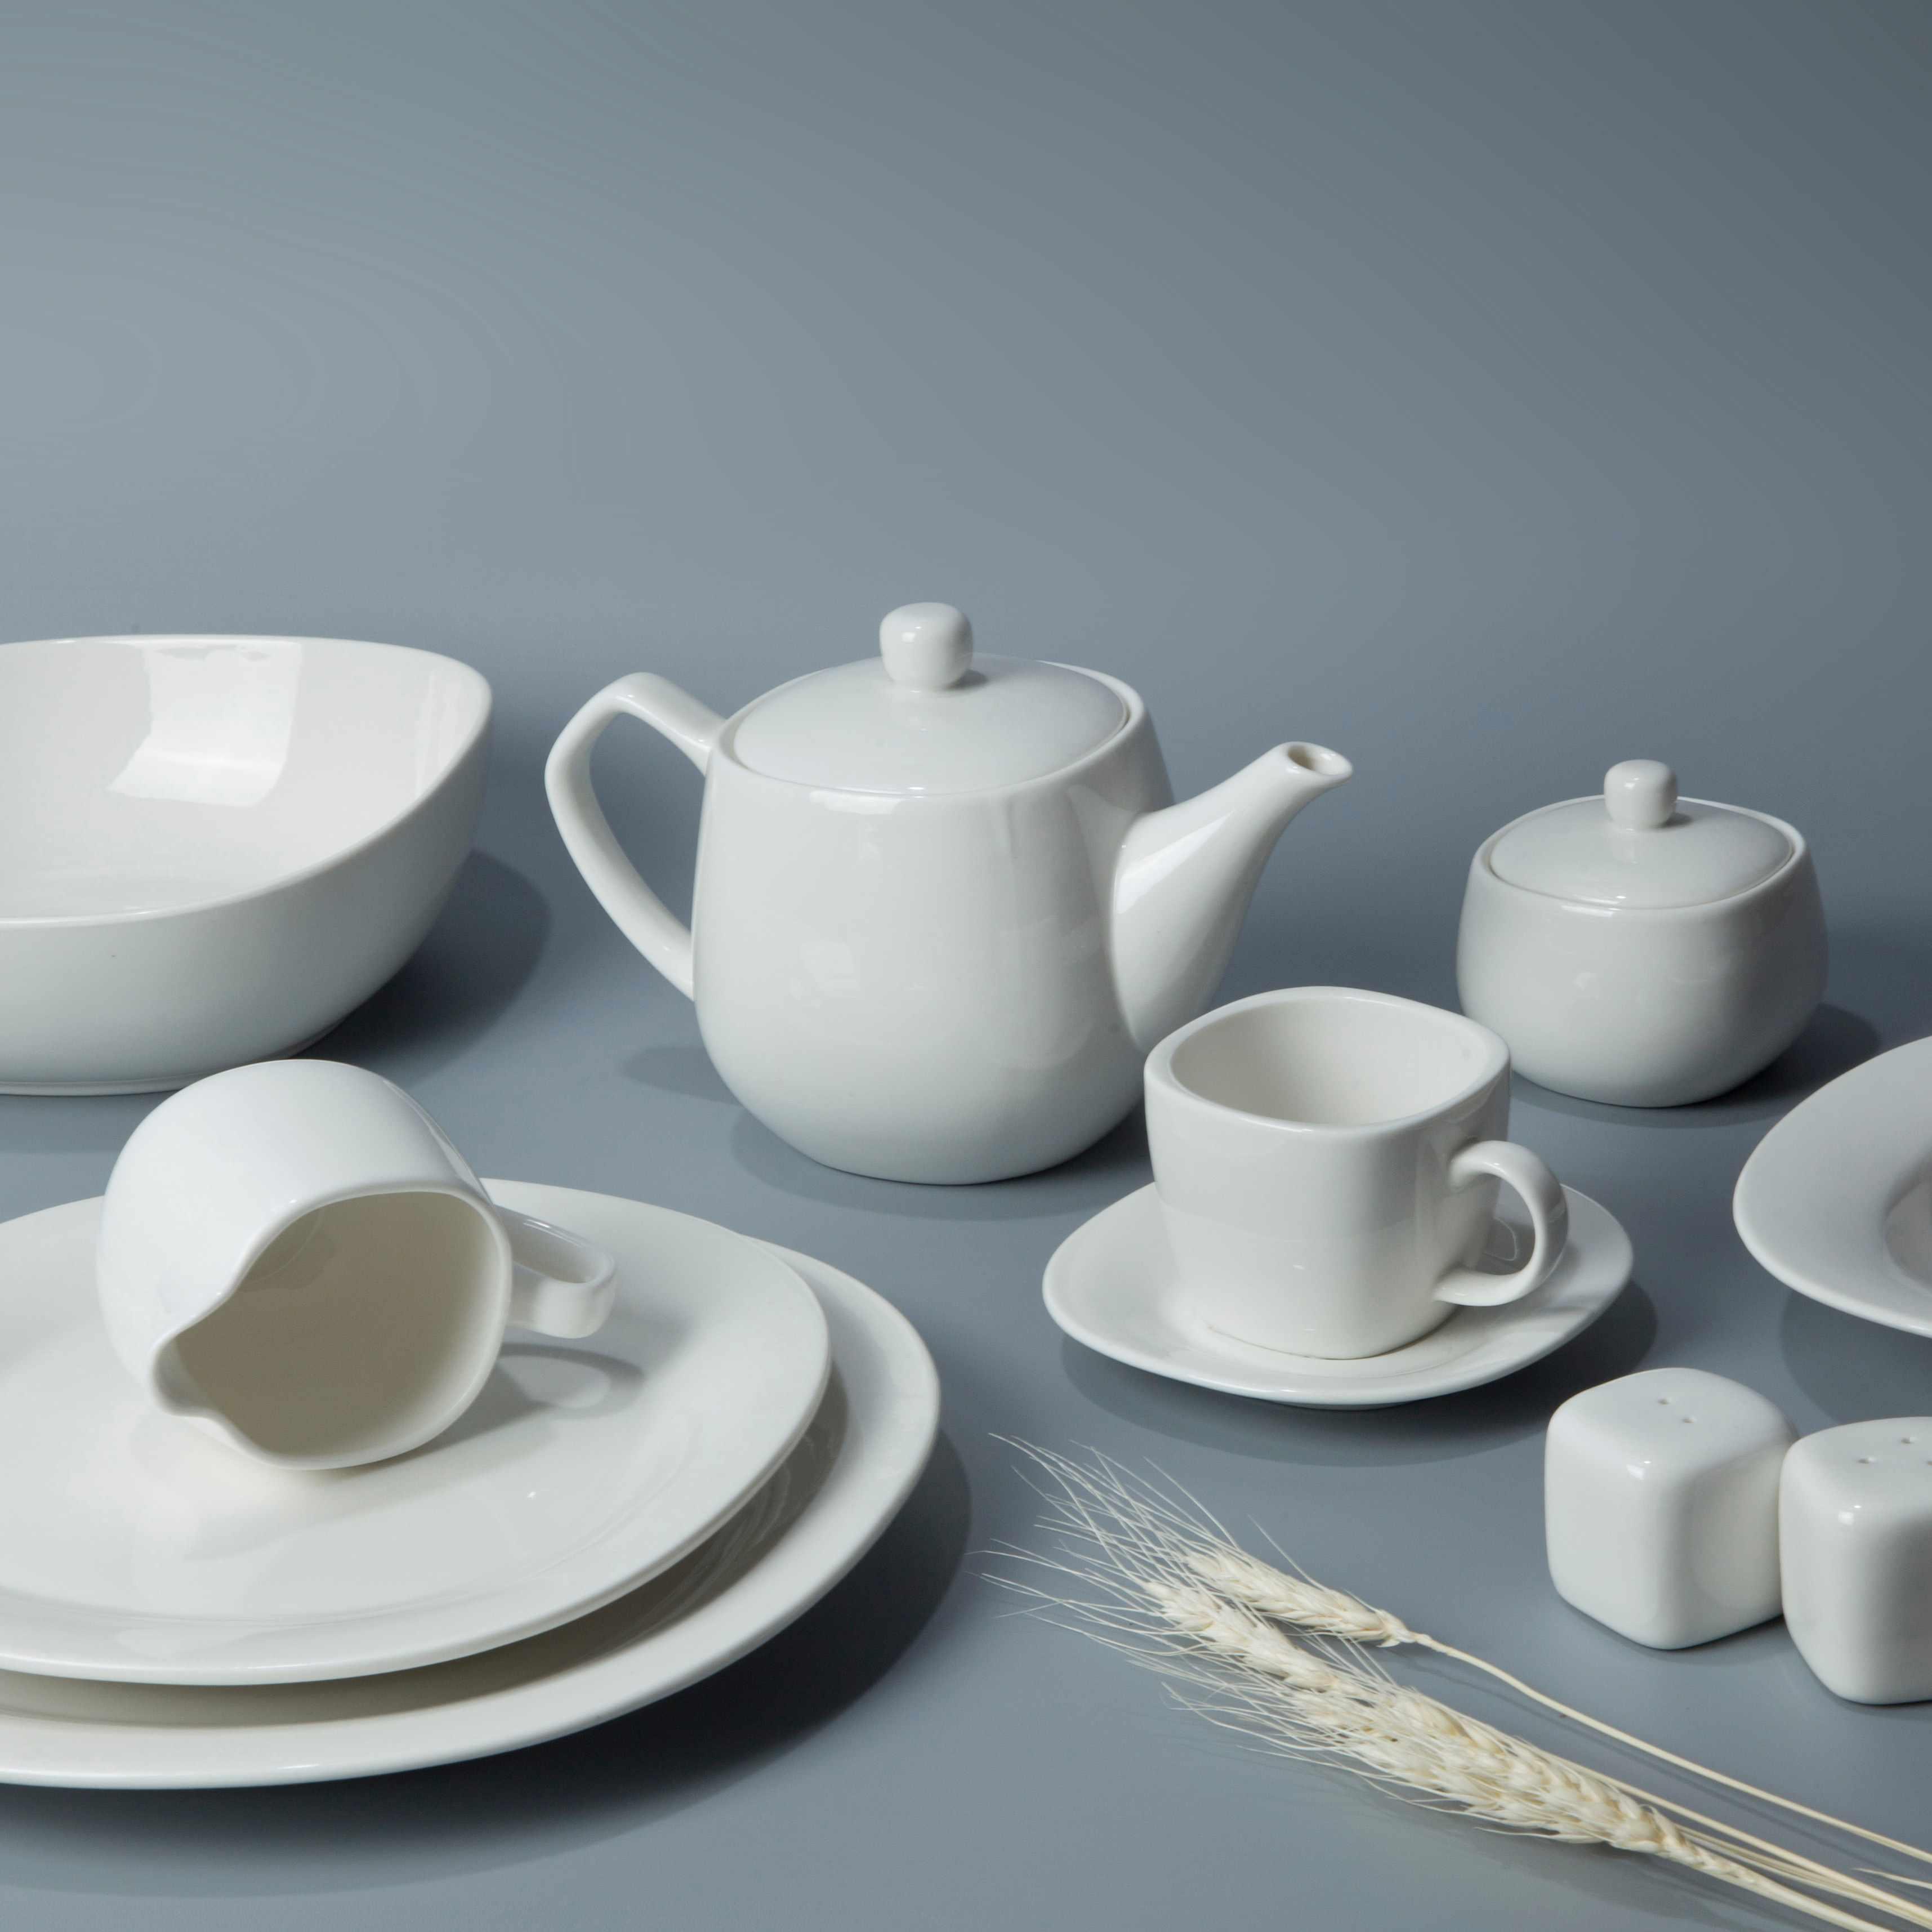 Two Eight White ceramic dinnerware set - YI XIN SERIES White Porcelain Dinner Set image14